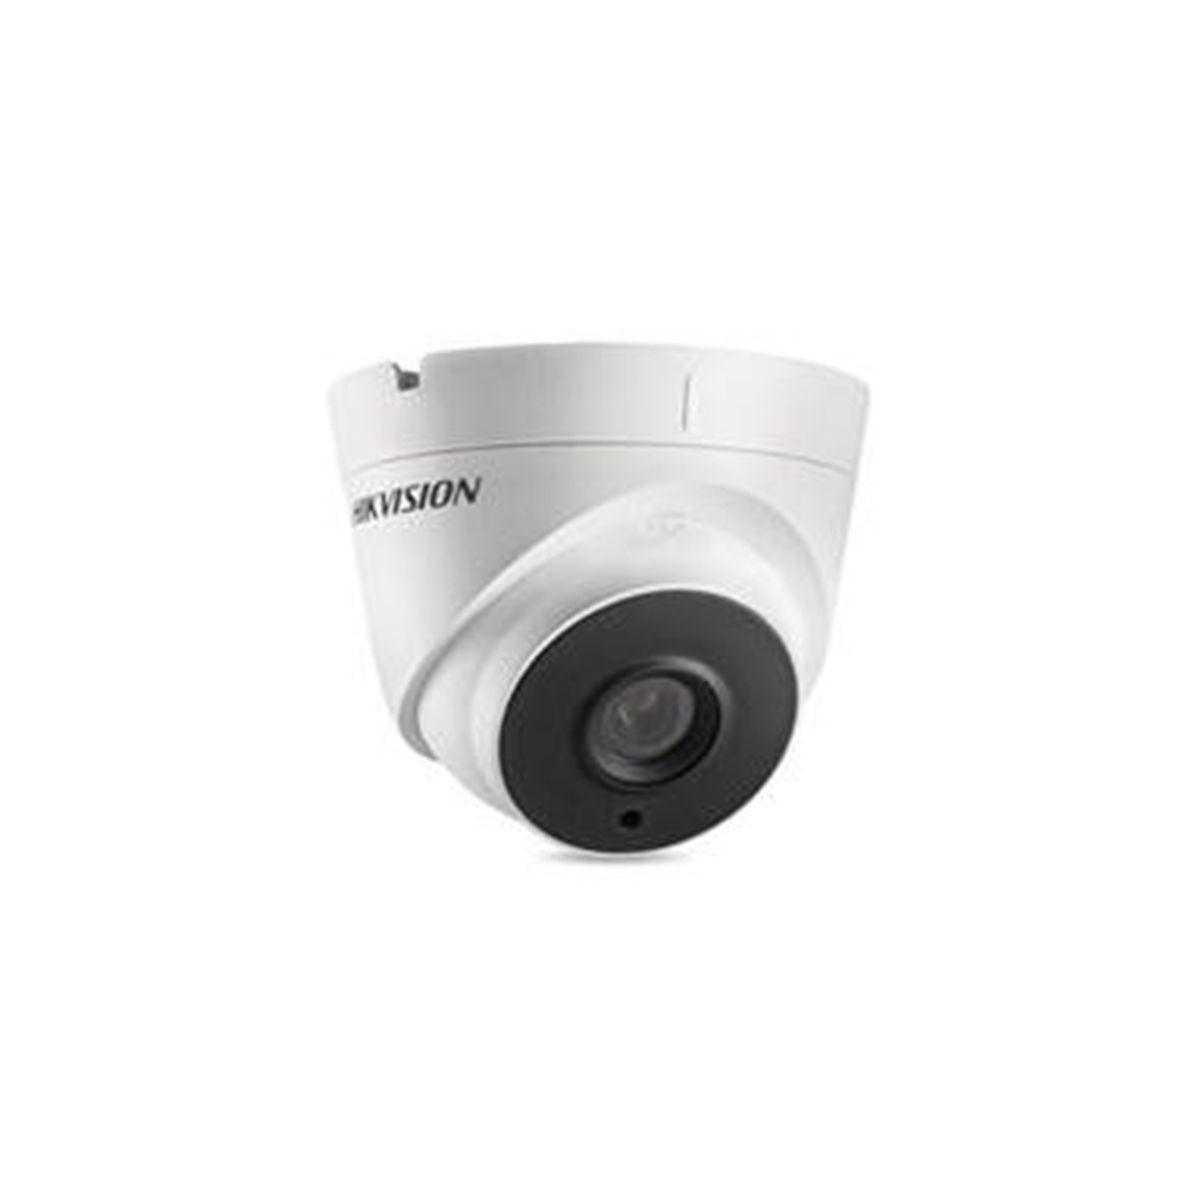 Cámara Hikvision Turbo HD Tipo Domo 8MP DS-2CE76U1T-ITPF 4K